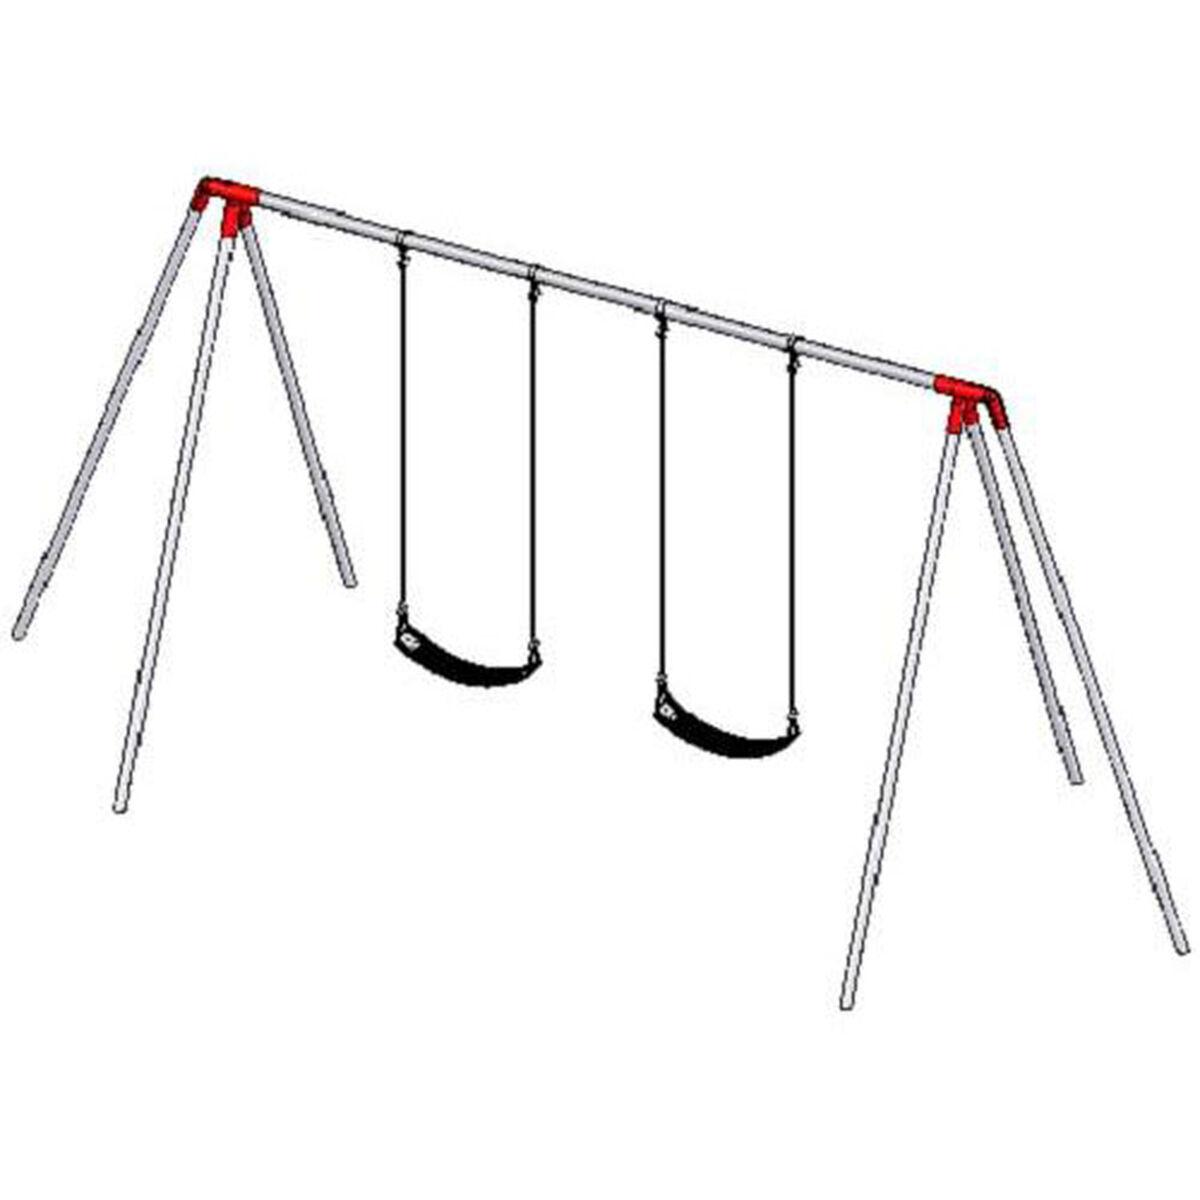 2 Seat Primary Bipod Swing Set 581 2208 Bizchair Com